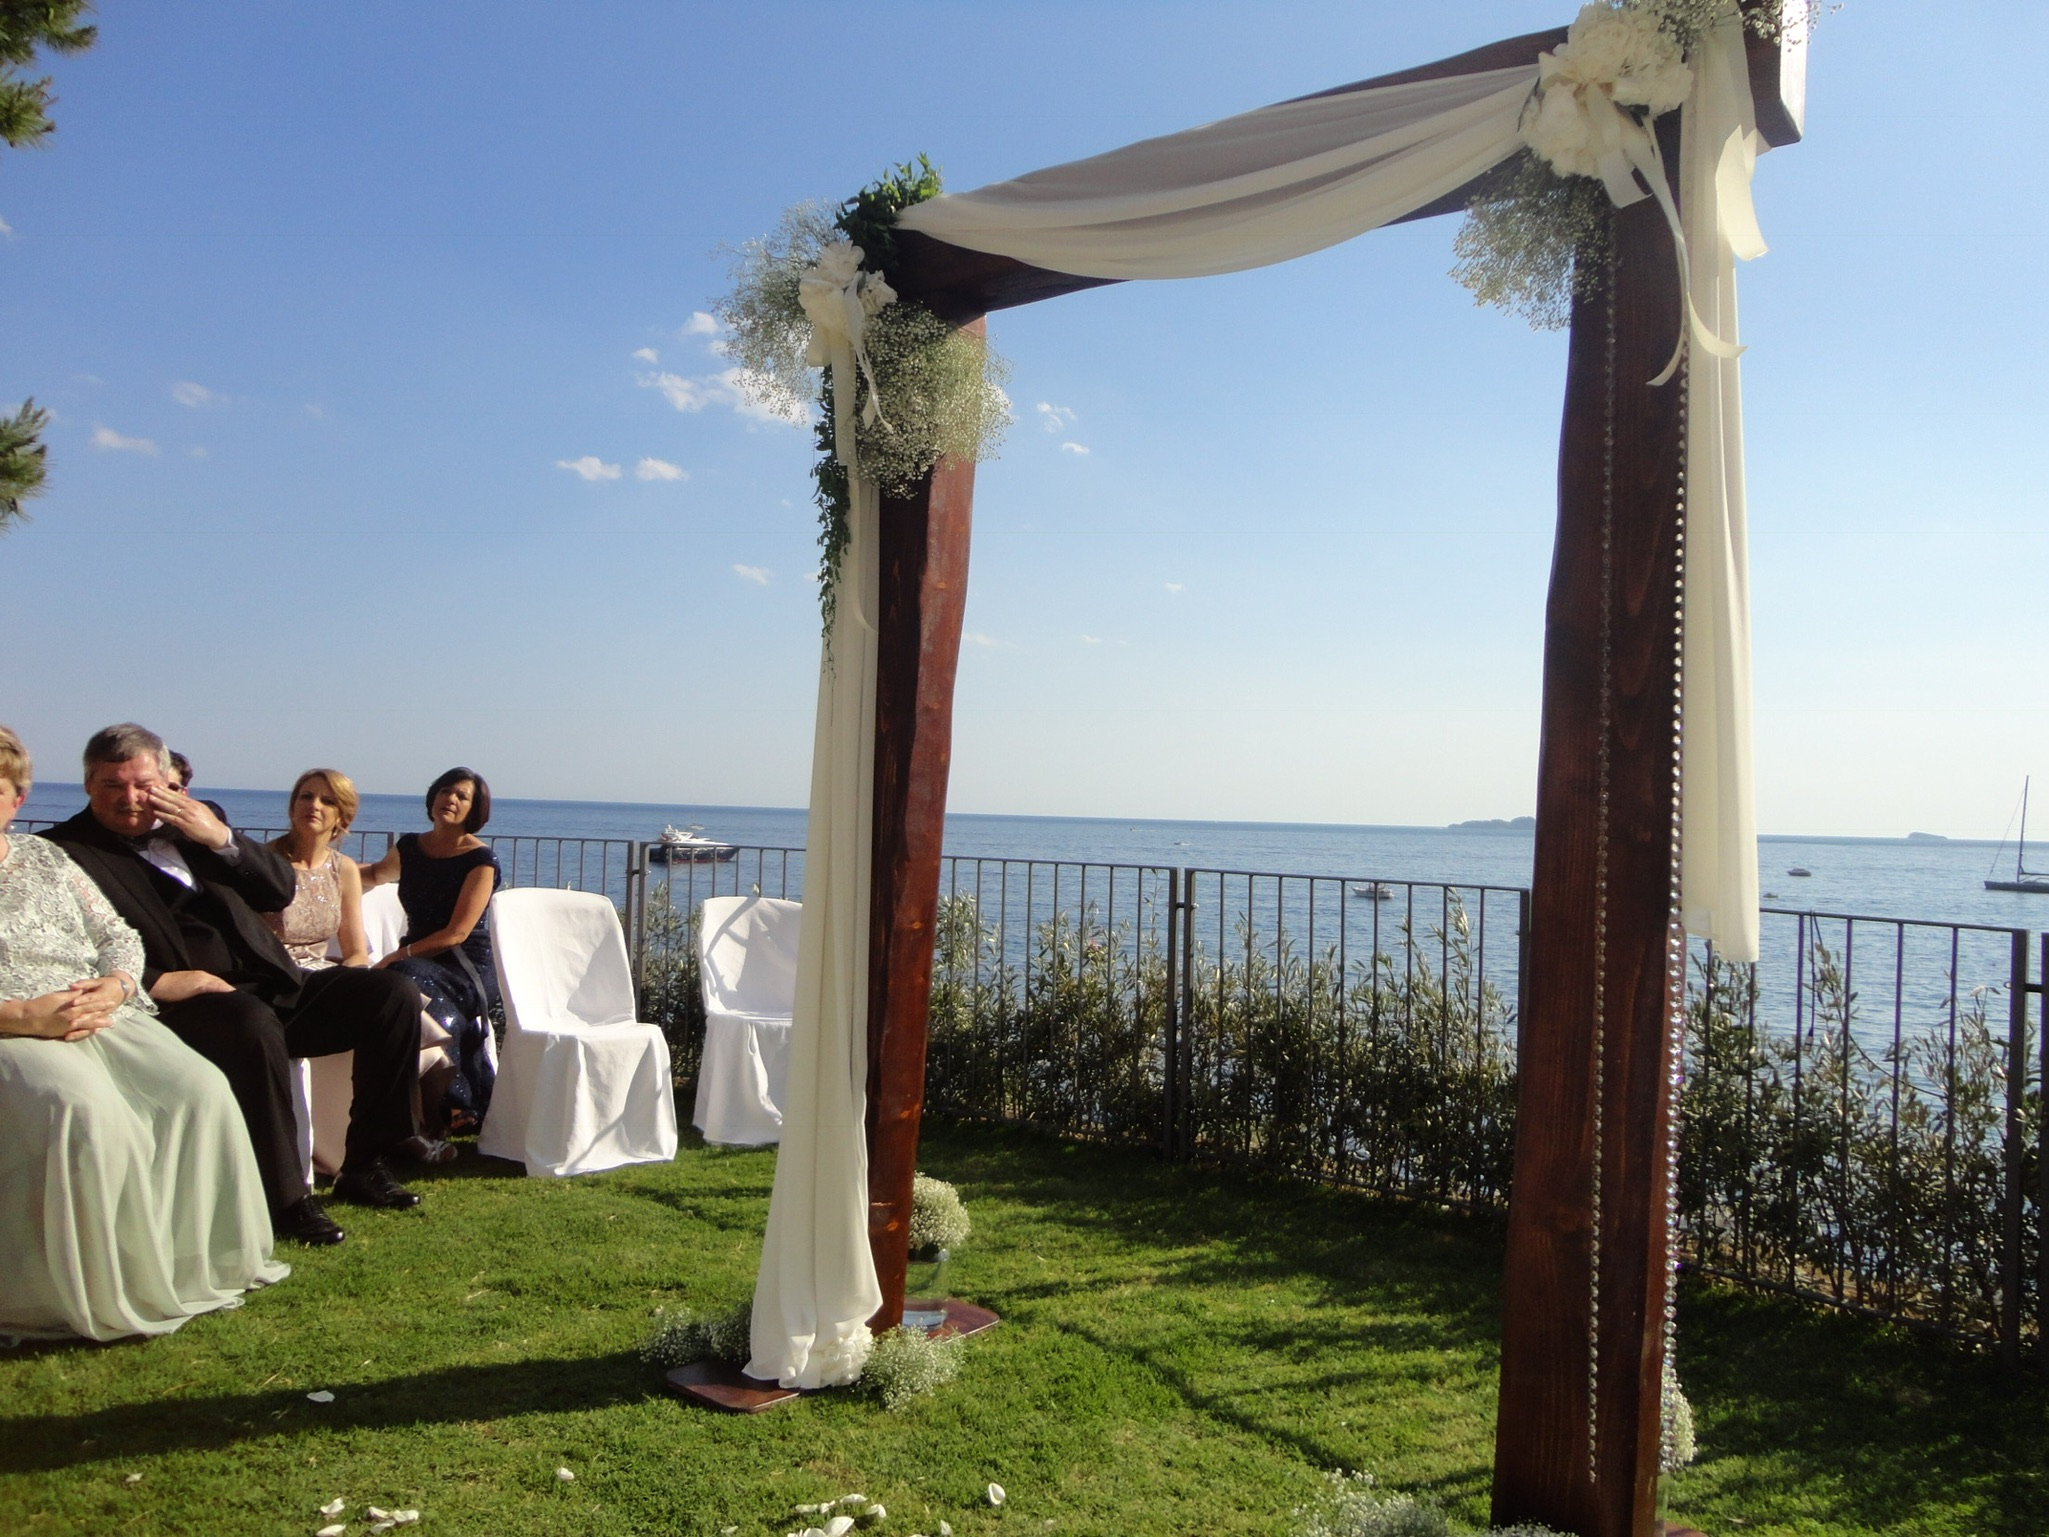 https://www.weddingamalfi.com/wp-content/uploads/Nathalie-and-Benjamin-wedding-in-Positano-32.jpg